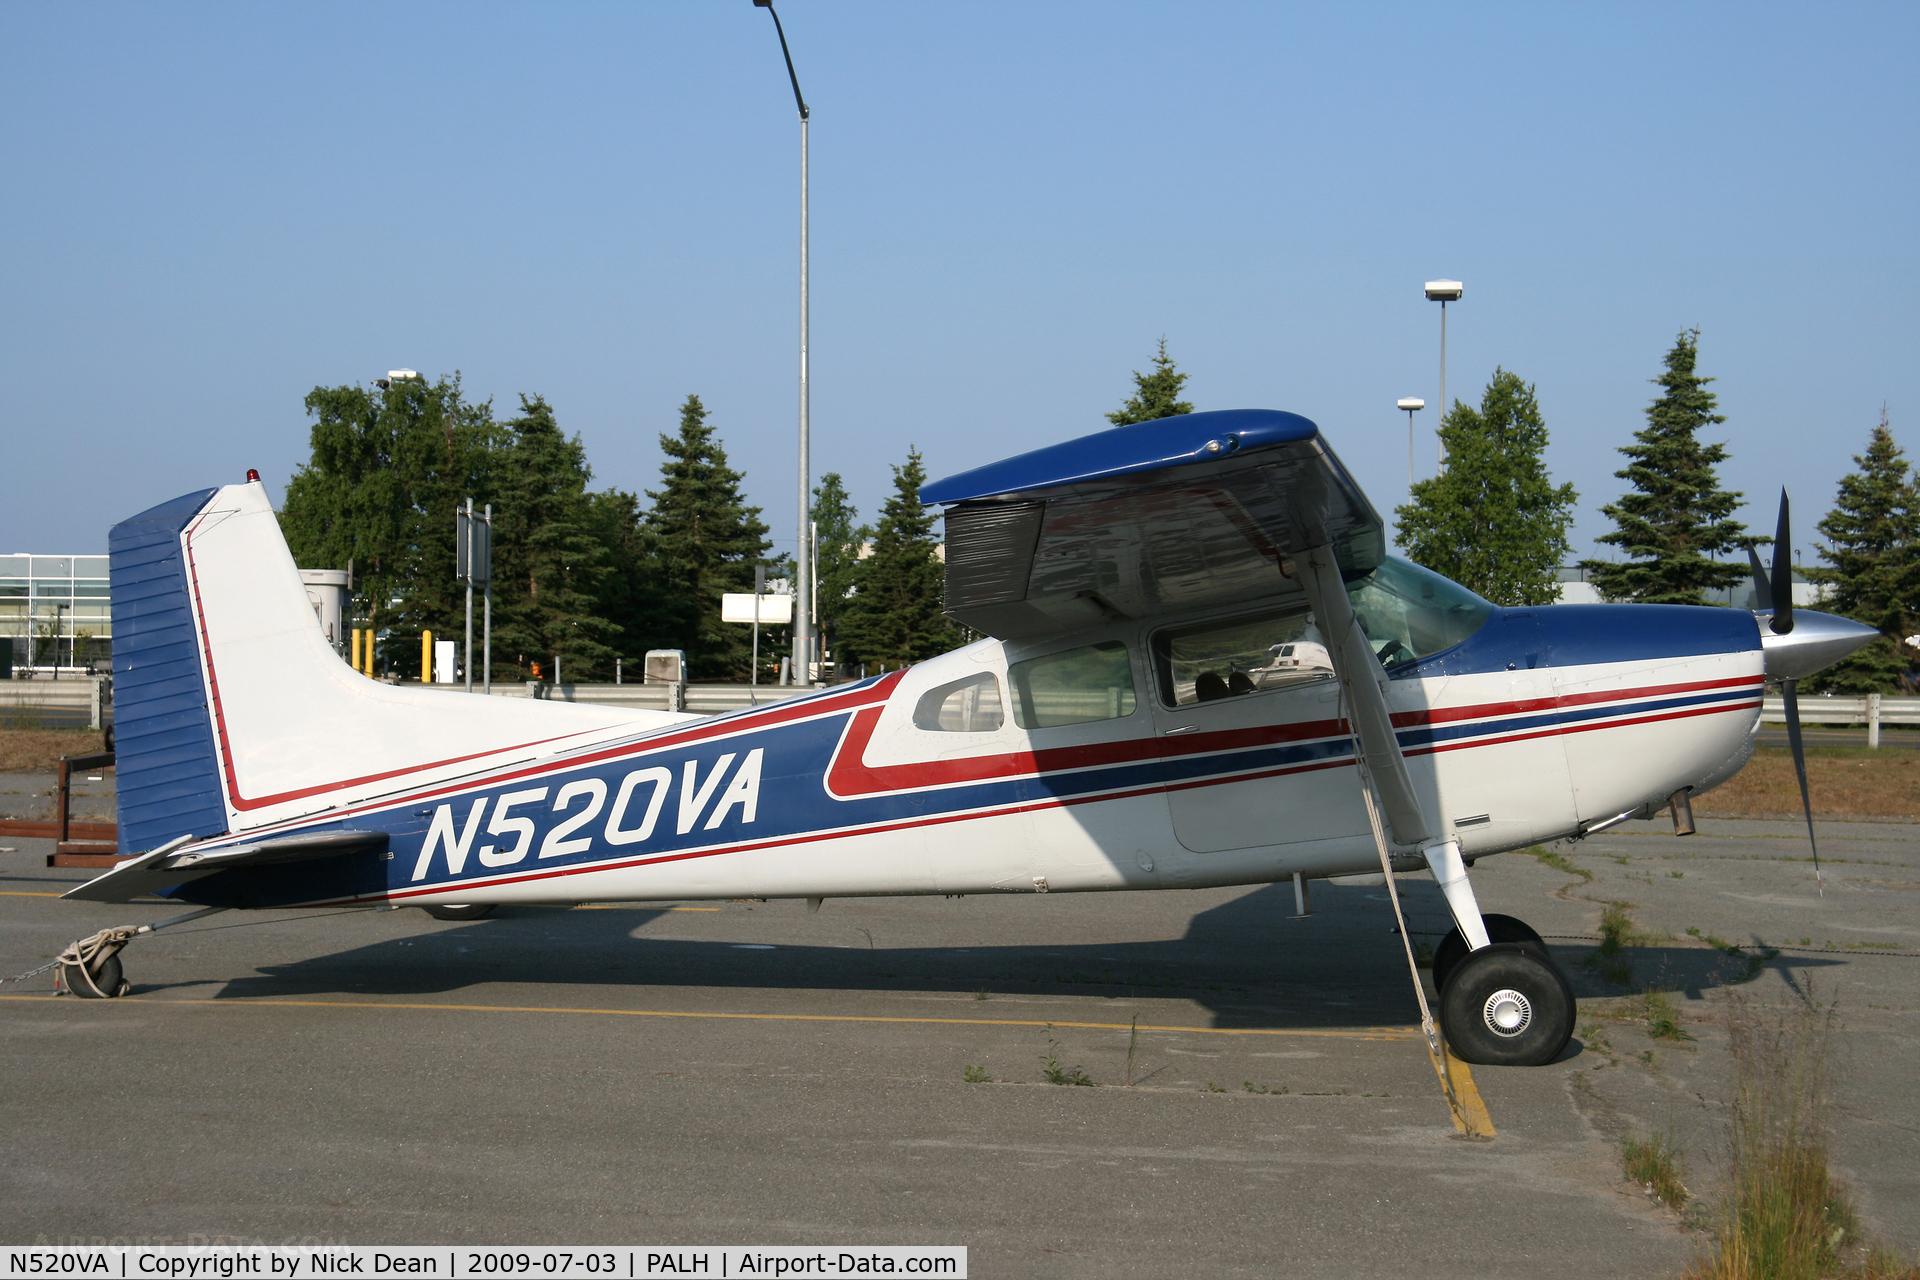 N520VA, 1977 Cessna A185F Skywagon 185 C/N 18503352, PALH